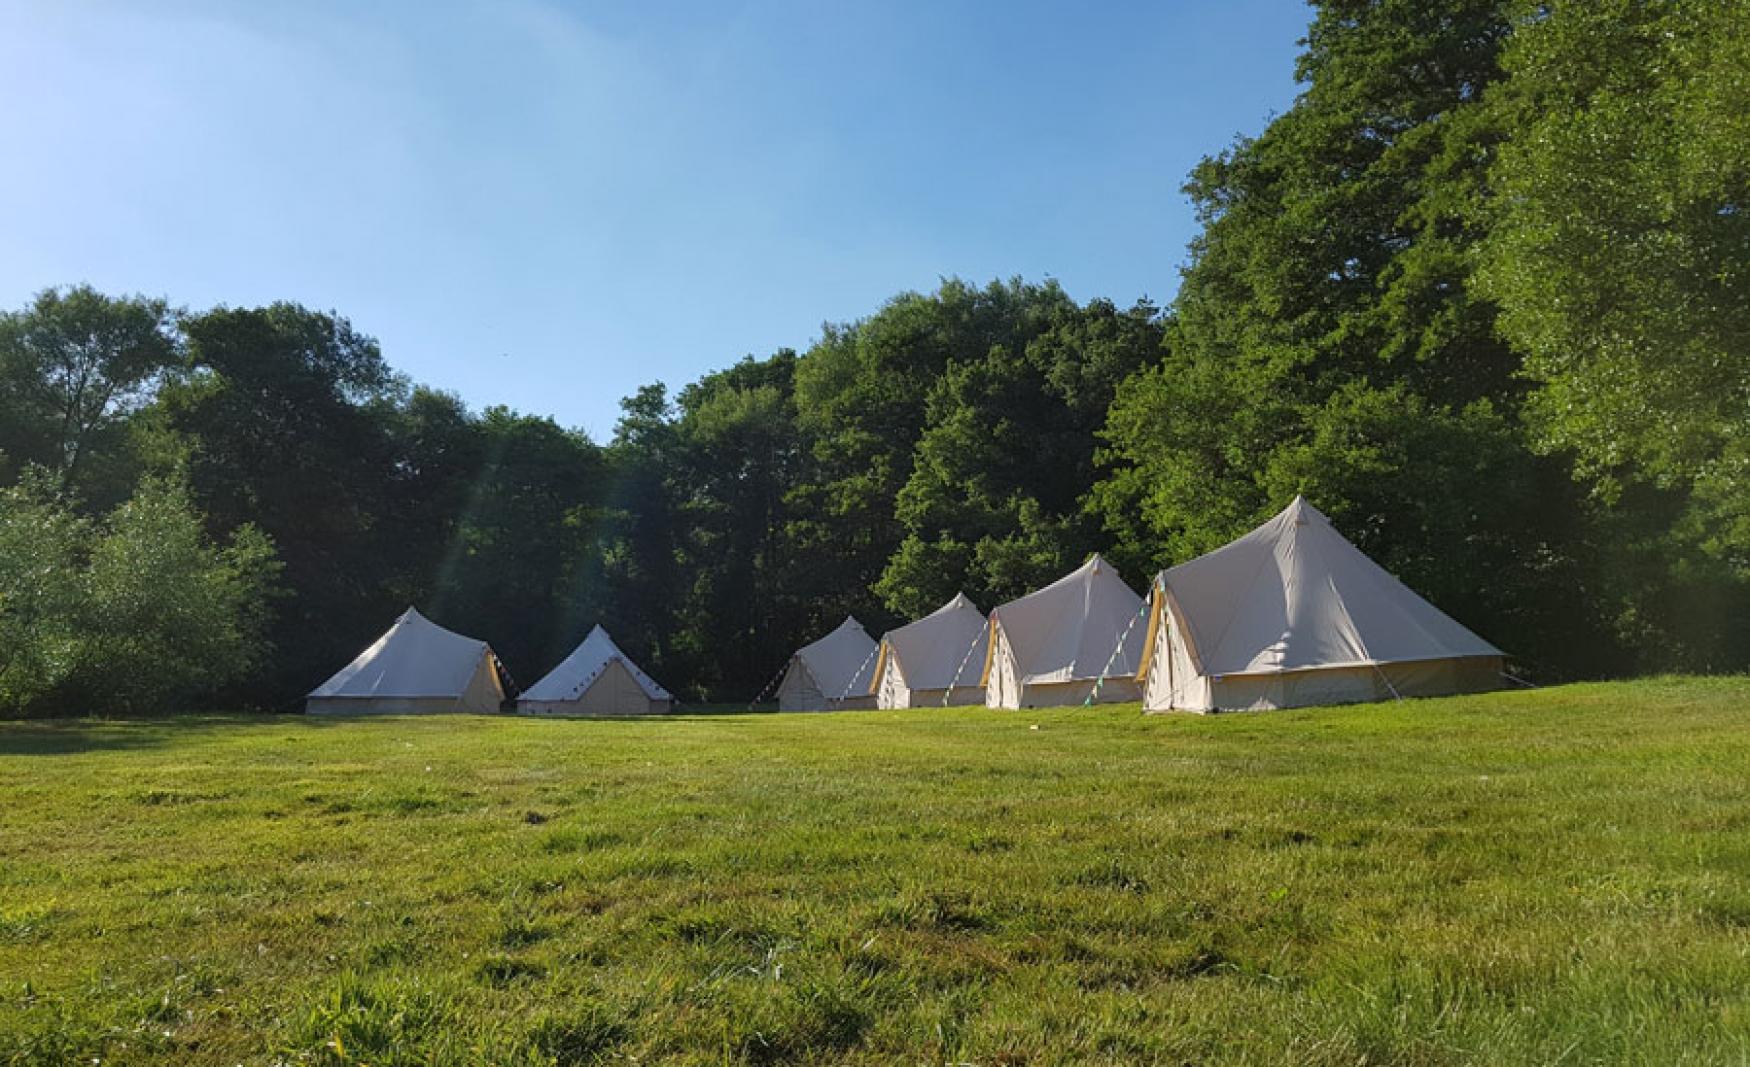 fiesta-fields-outdoor-wedding-events-company-tipi-surrey-sussex-eashing-farm-godalming-2